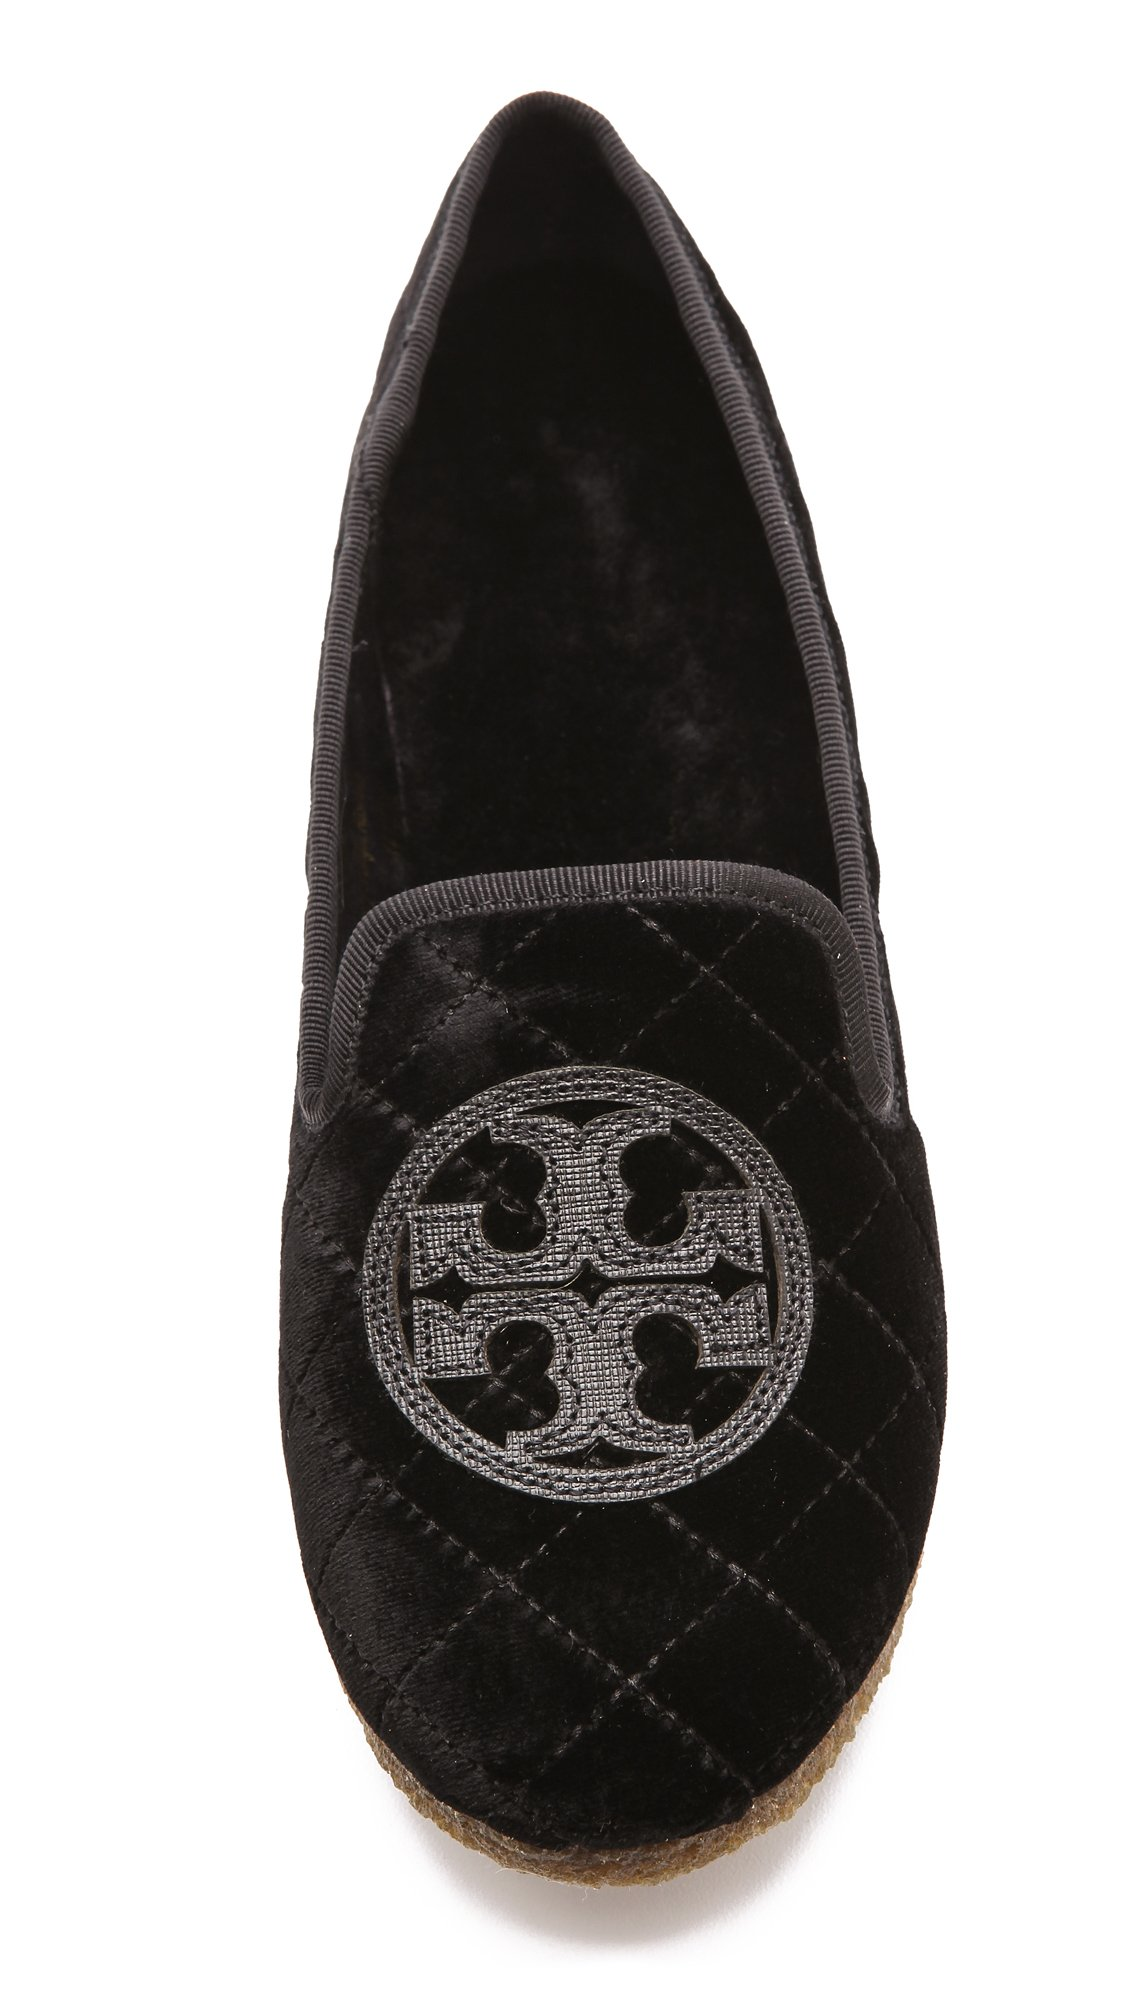 Tory Burch Quilted Billy Slipper, Smart Velvet/Leather, Black (6 B(M) US)